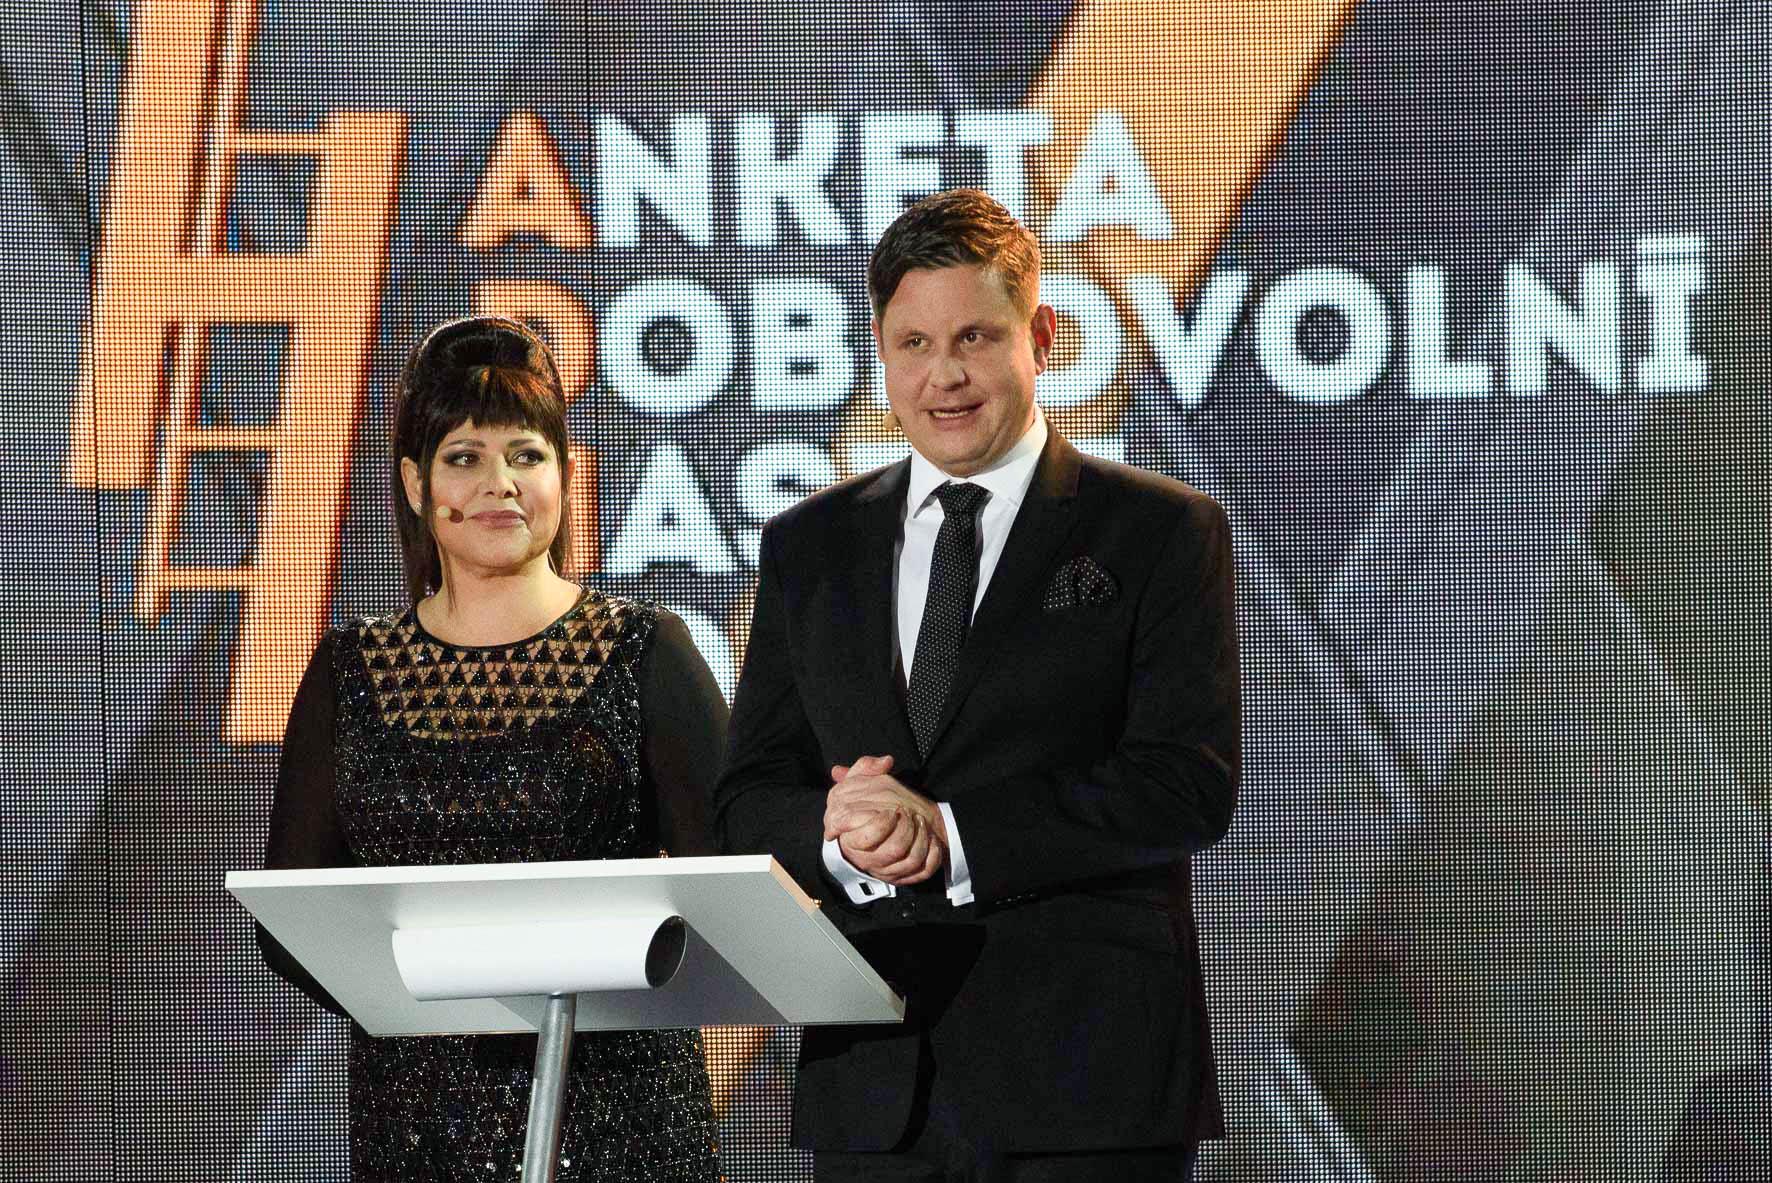 ilona-csakova-moderatorka-vyhlaseni-vysledku-adhr-2015